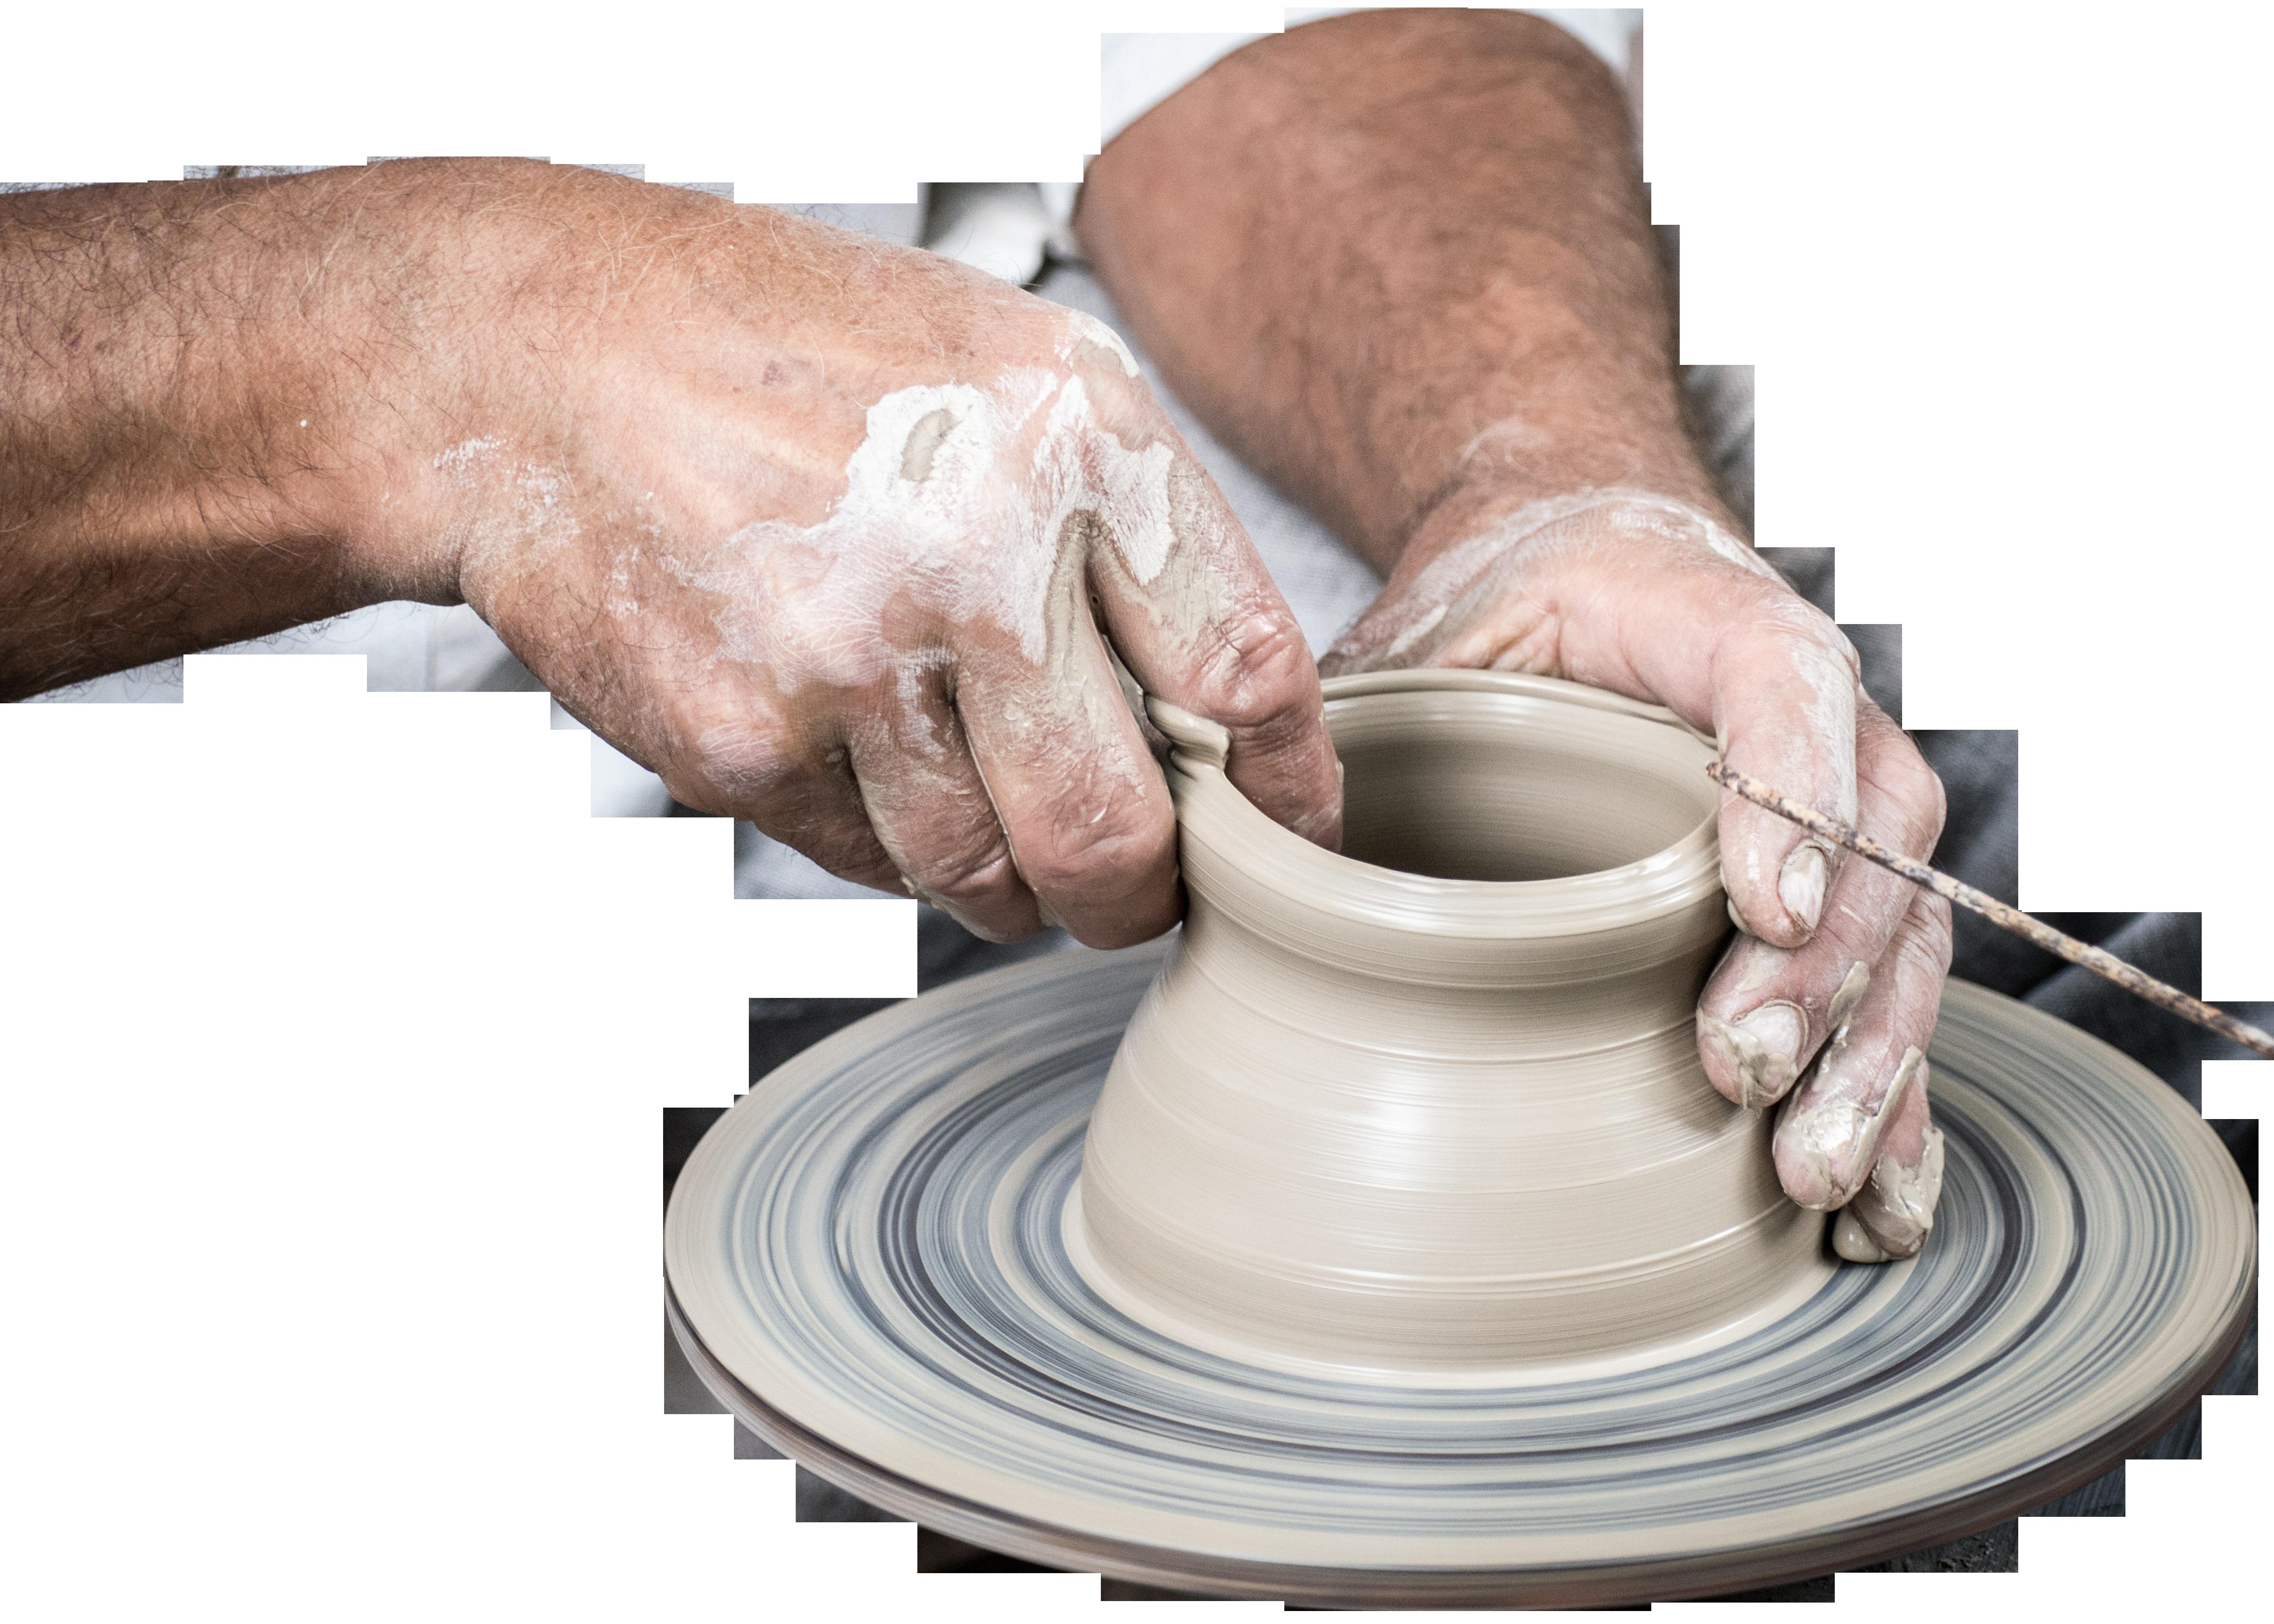 Handmade Vase Pottery PNG Image.